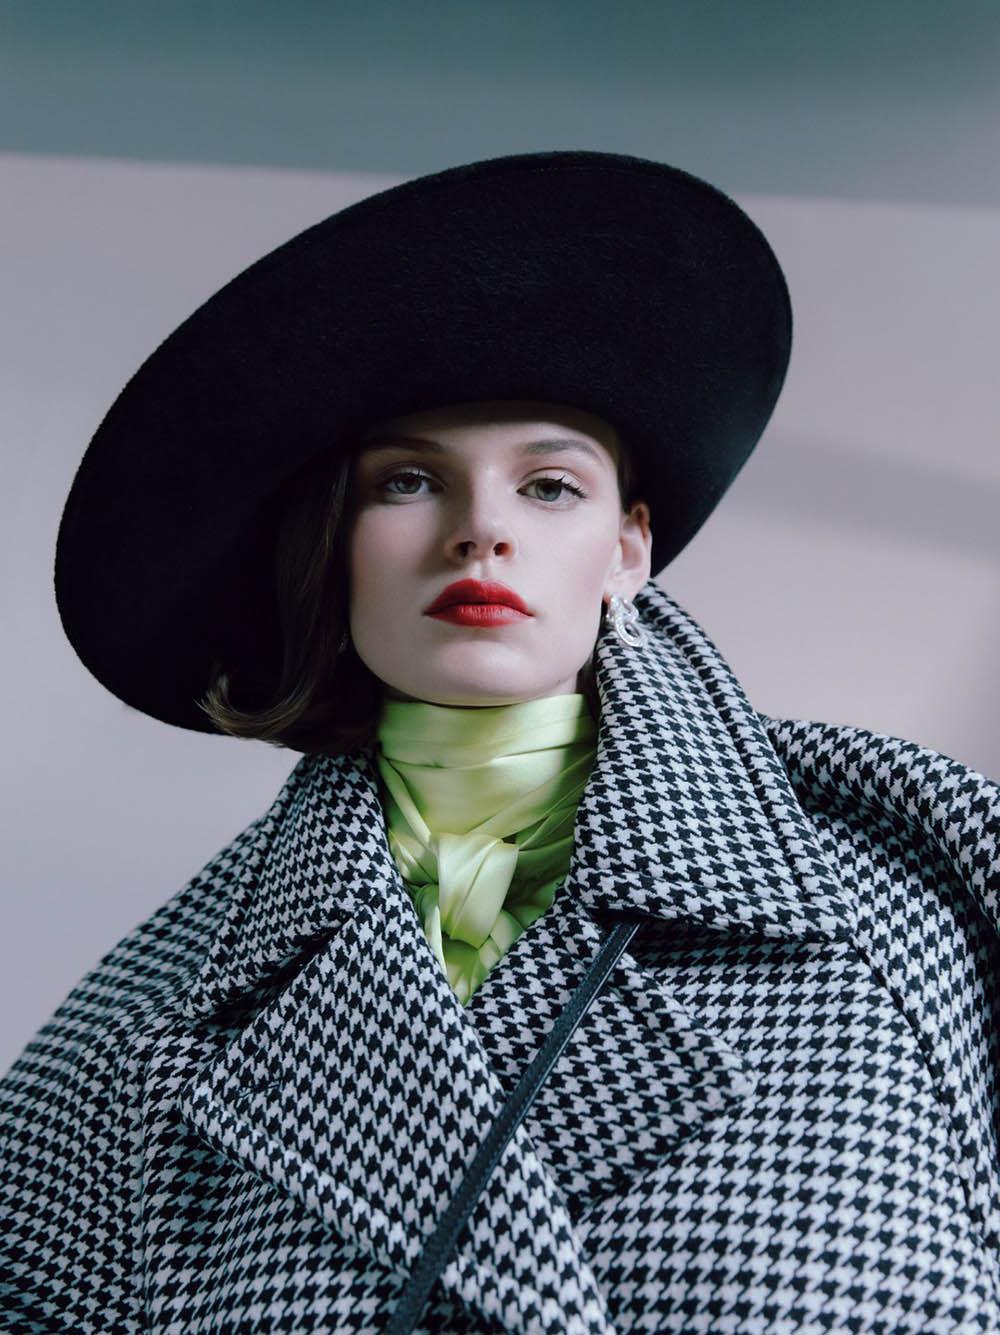 ''Fade To Grey'' by Kristin-Lee Moolman for British Vogue November 2019